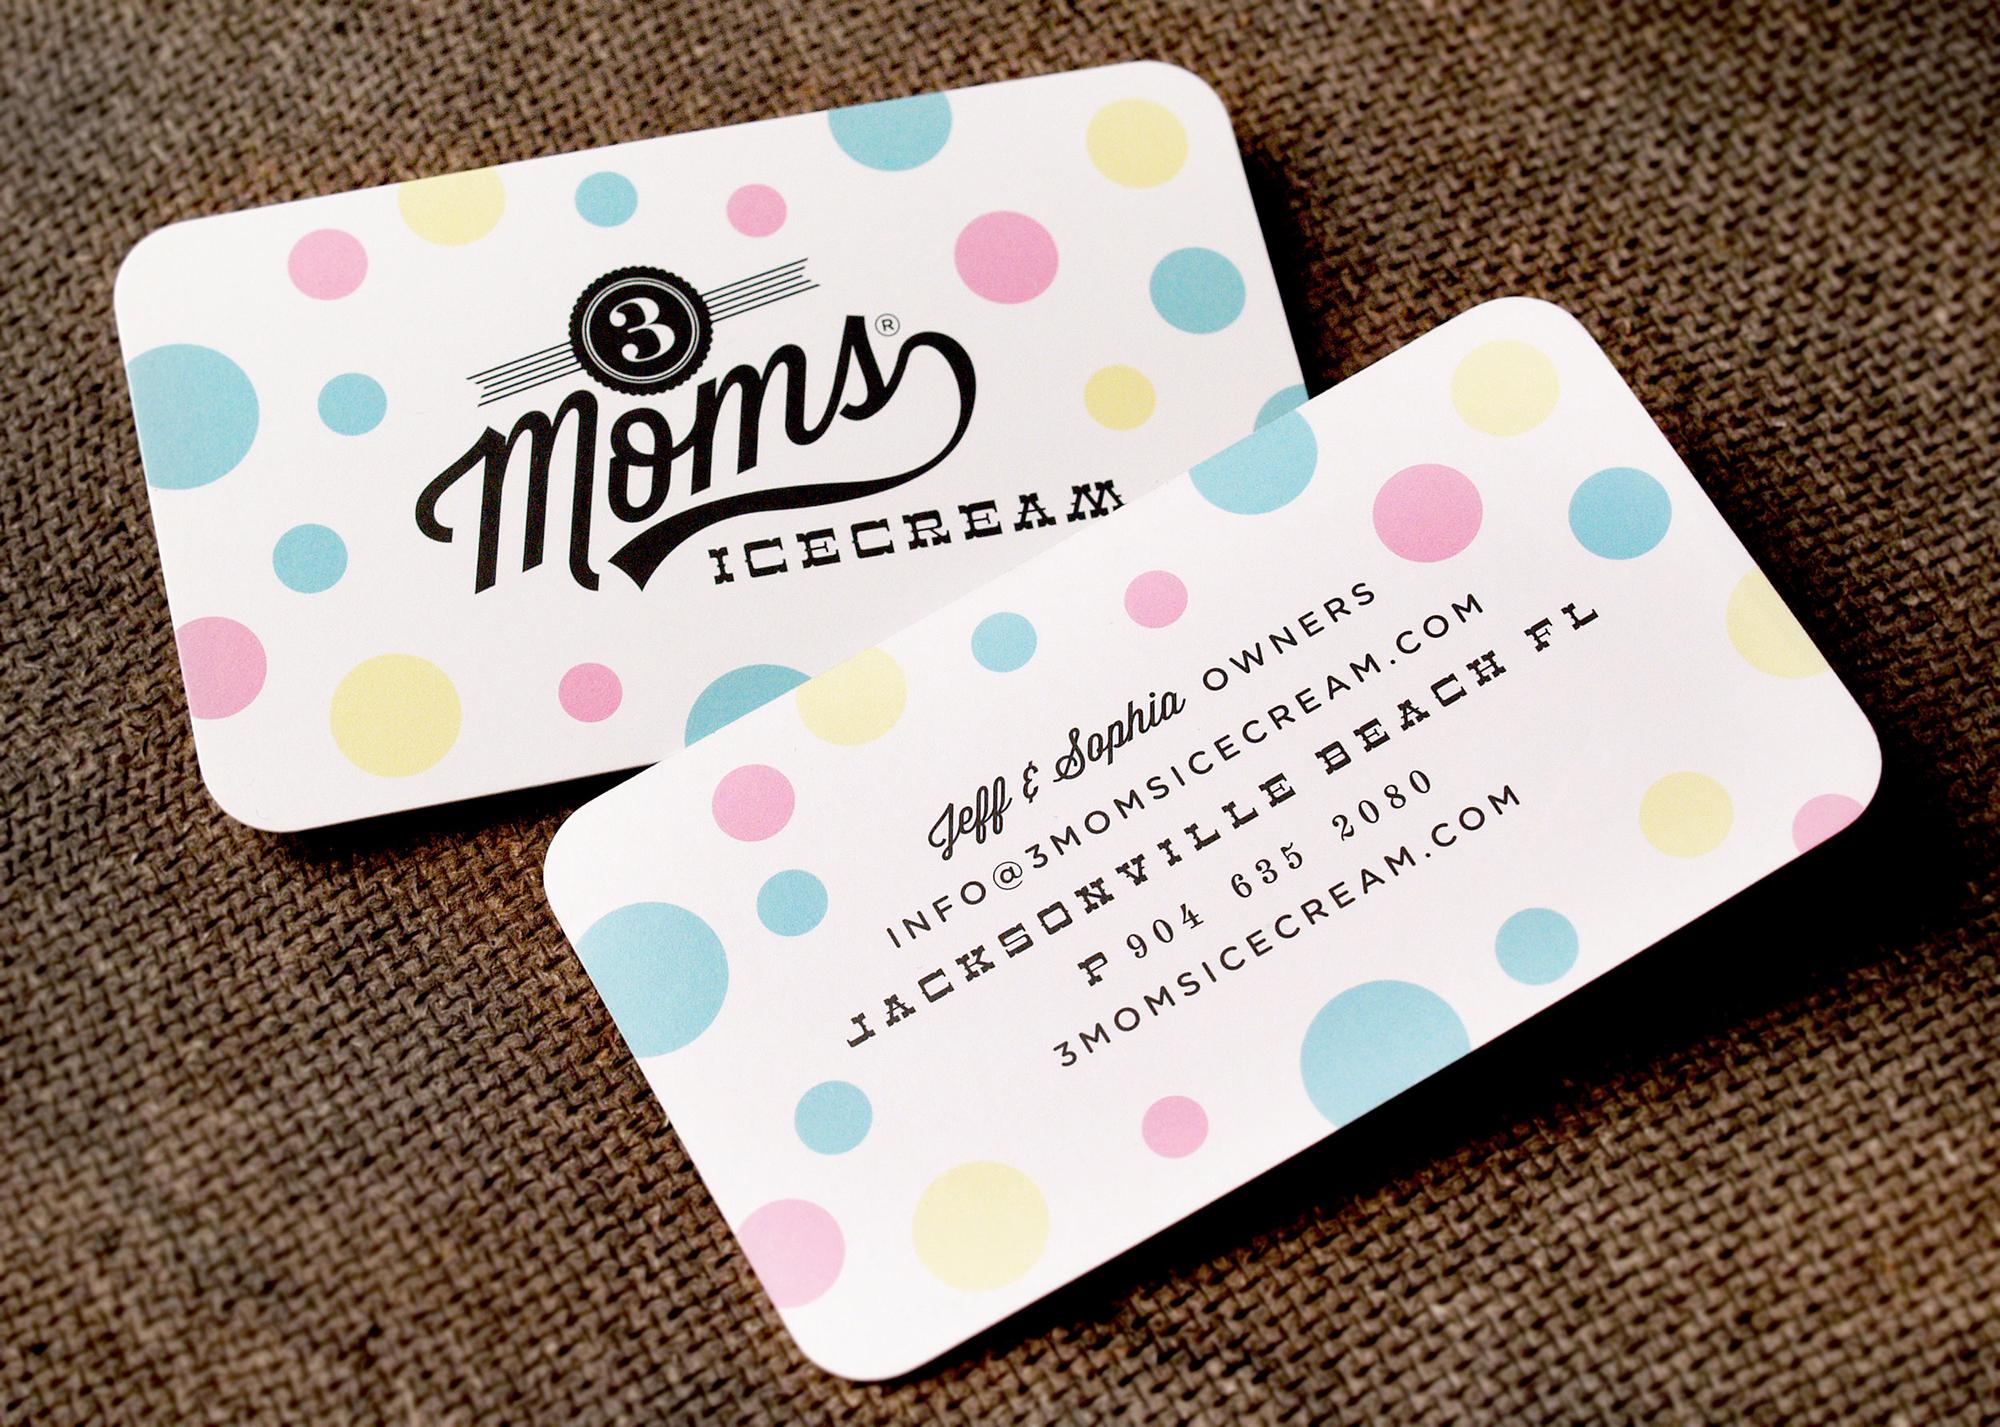 3 Moms Ice Cream _ Funnel.tv | Eric Kass